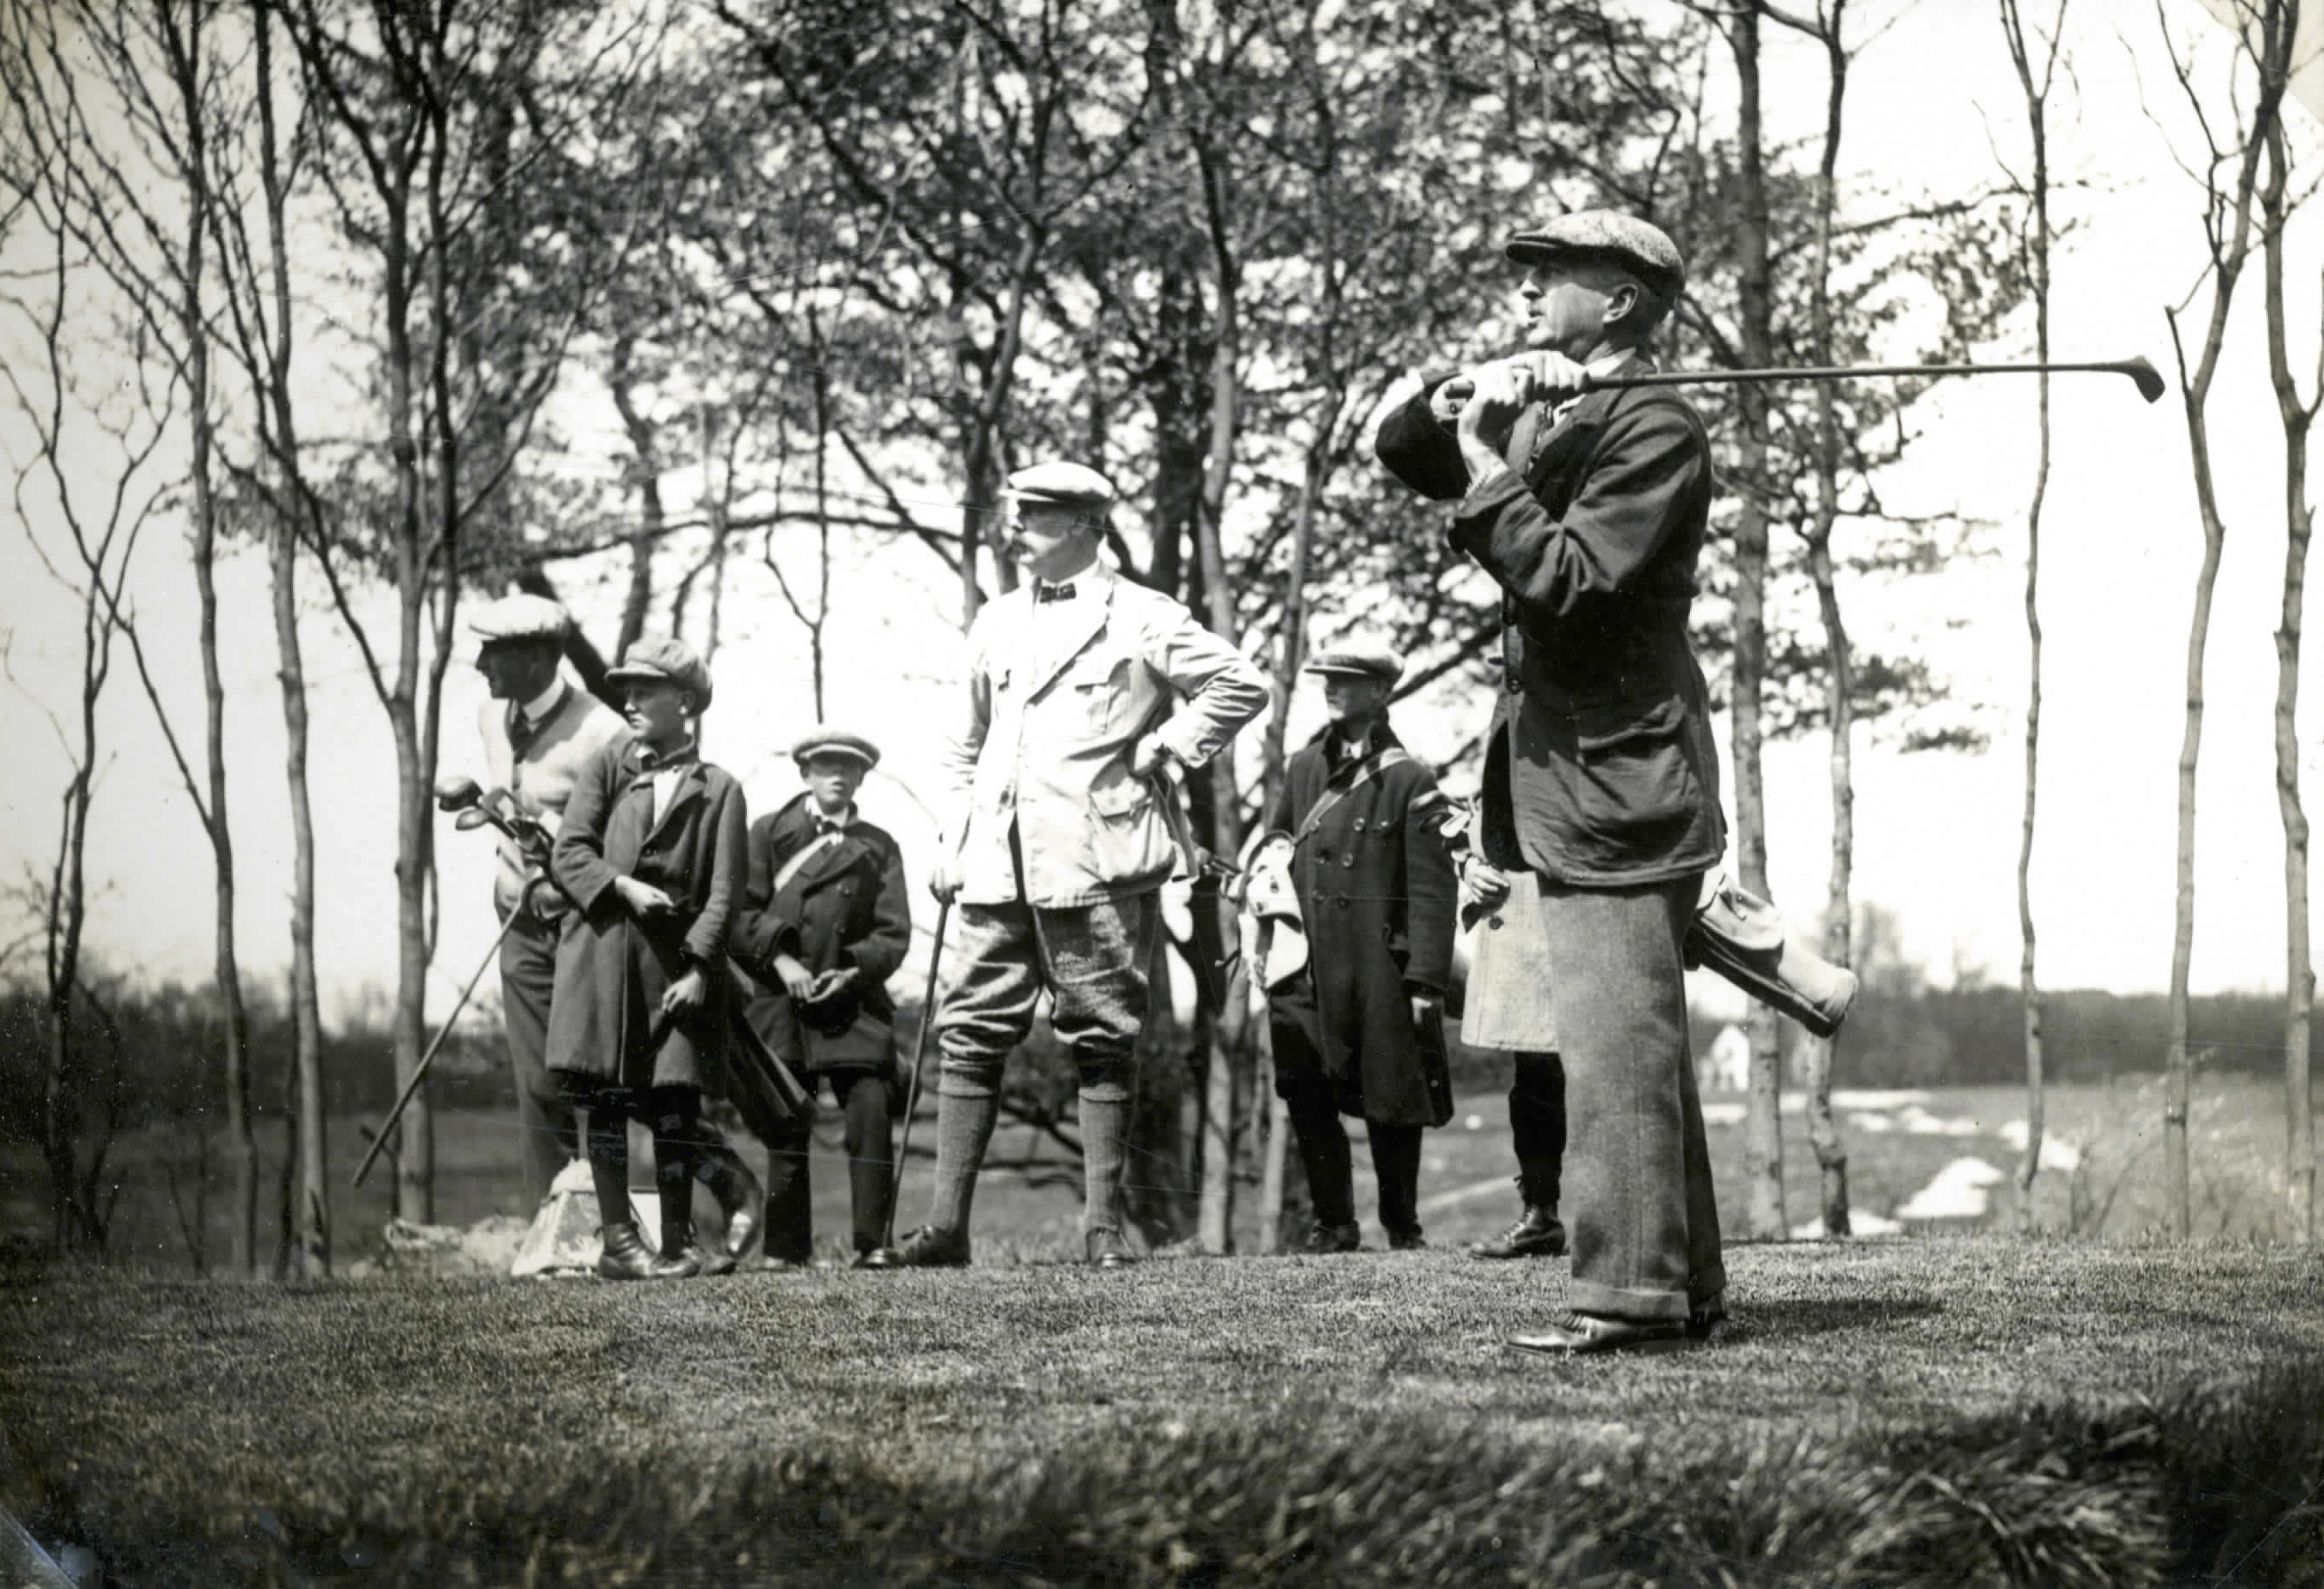 Bn. de Molembaix drivende; Boissevain - 1924